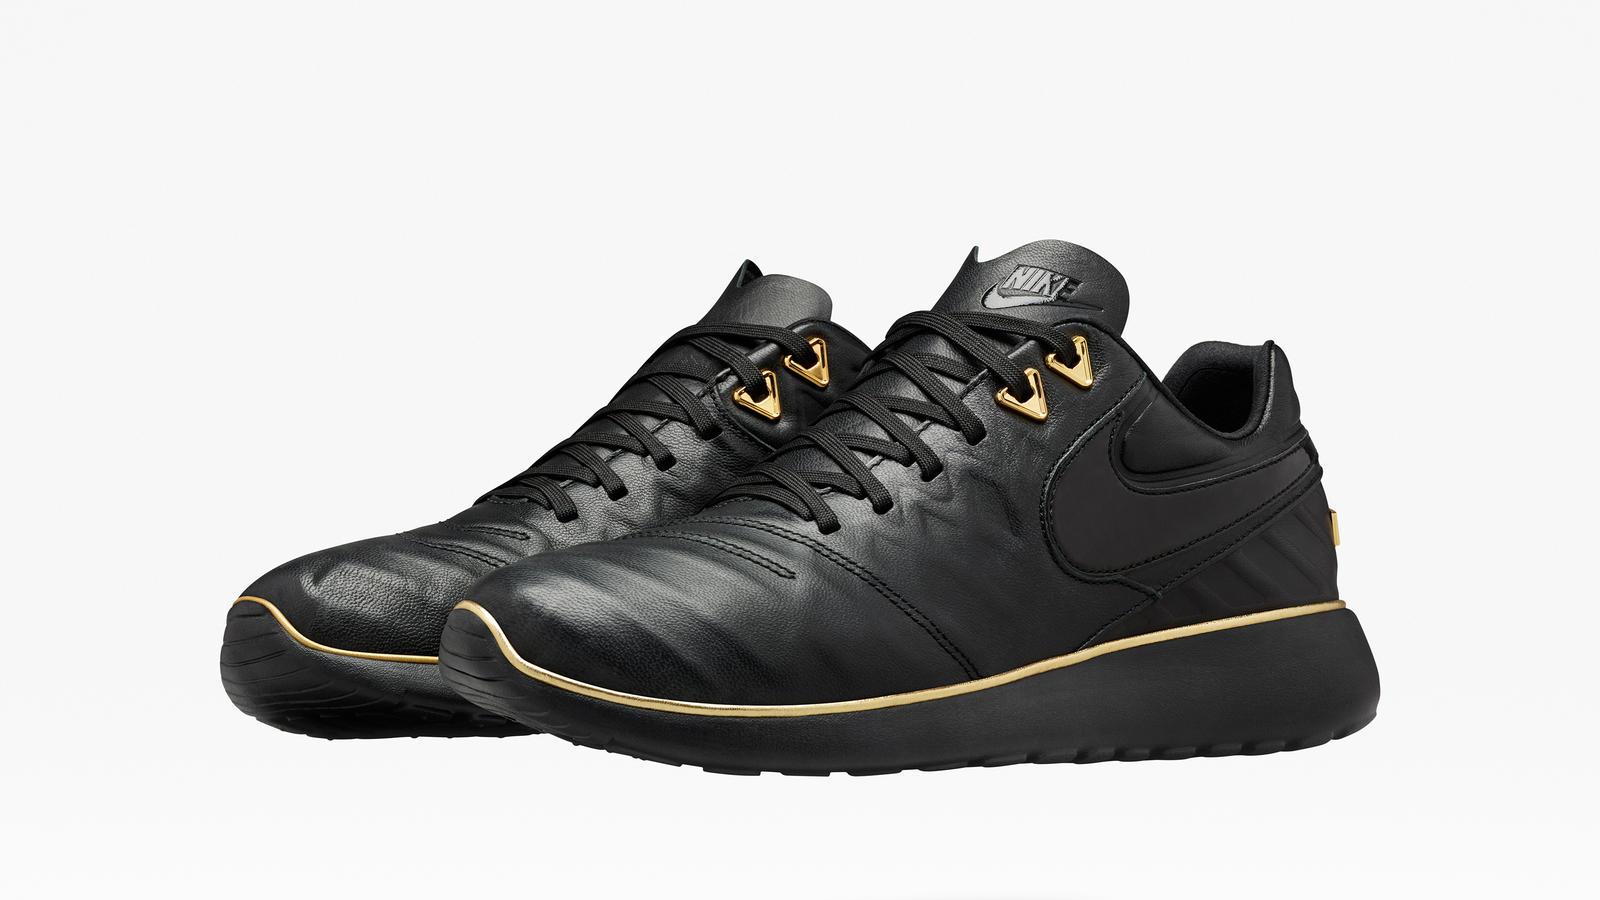 NikeLab_Roshe_Tiempo_VI_x_OR_4_hd_1600.jpg